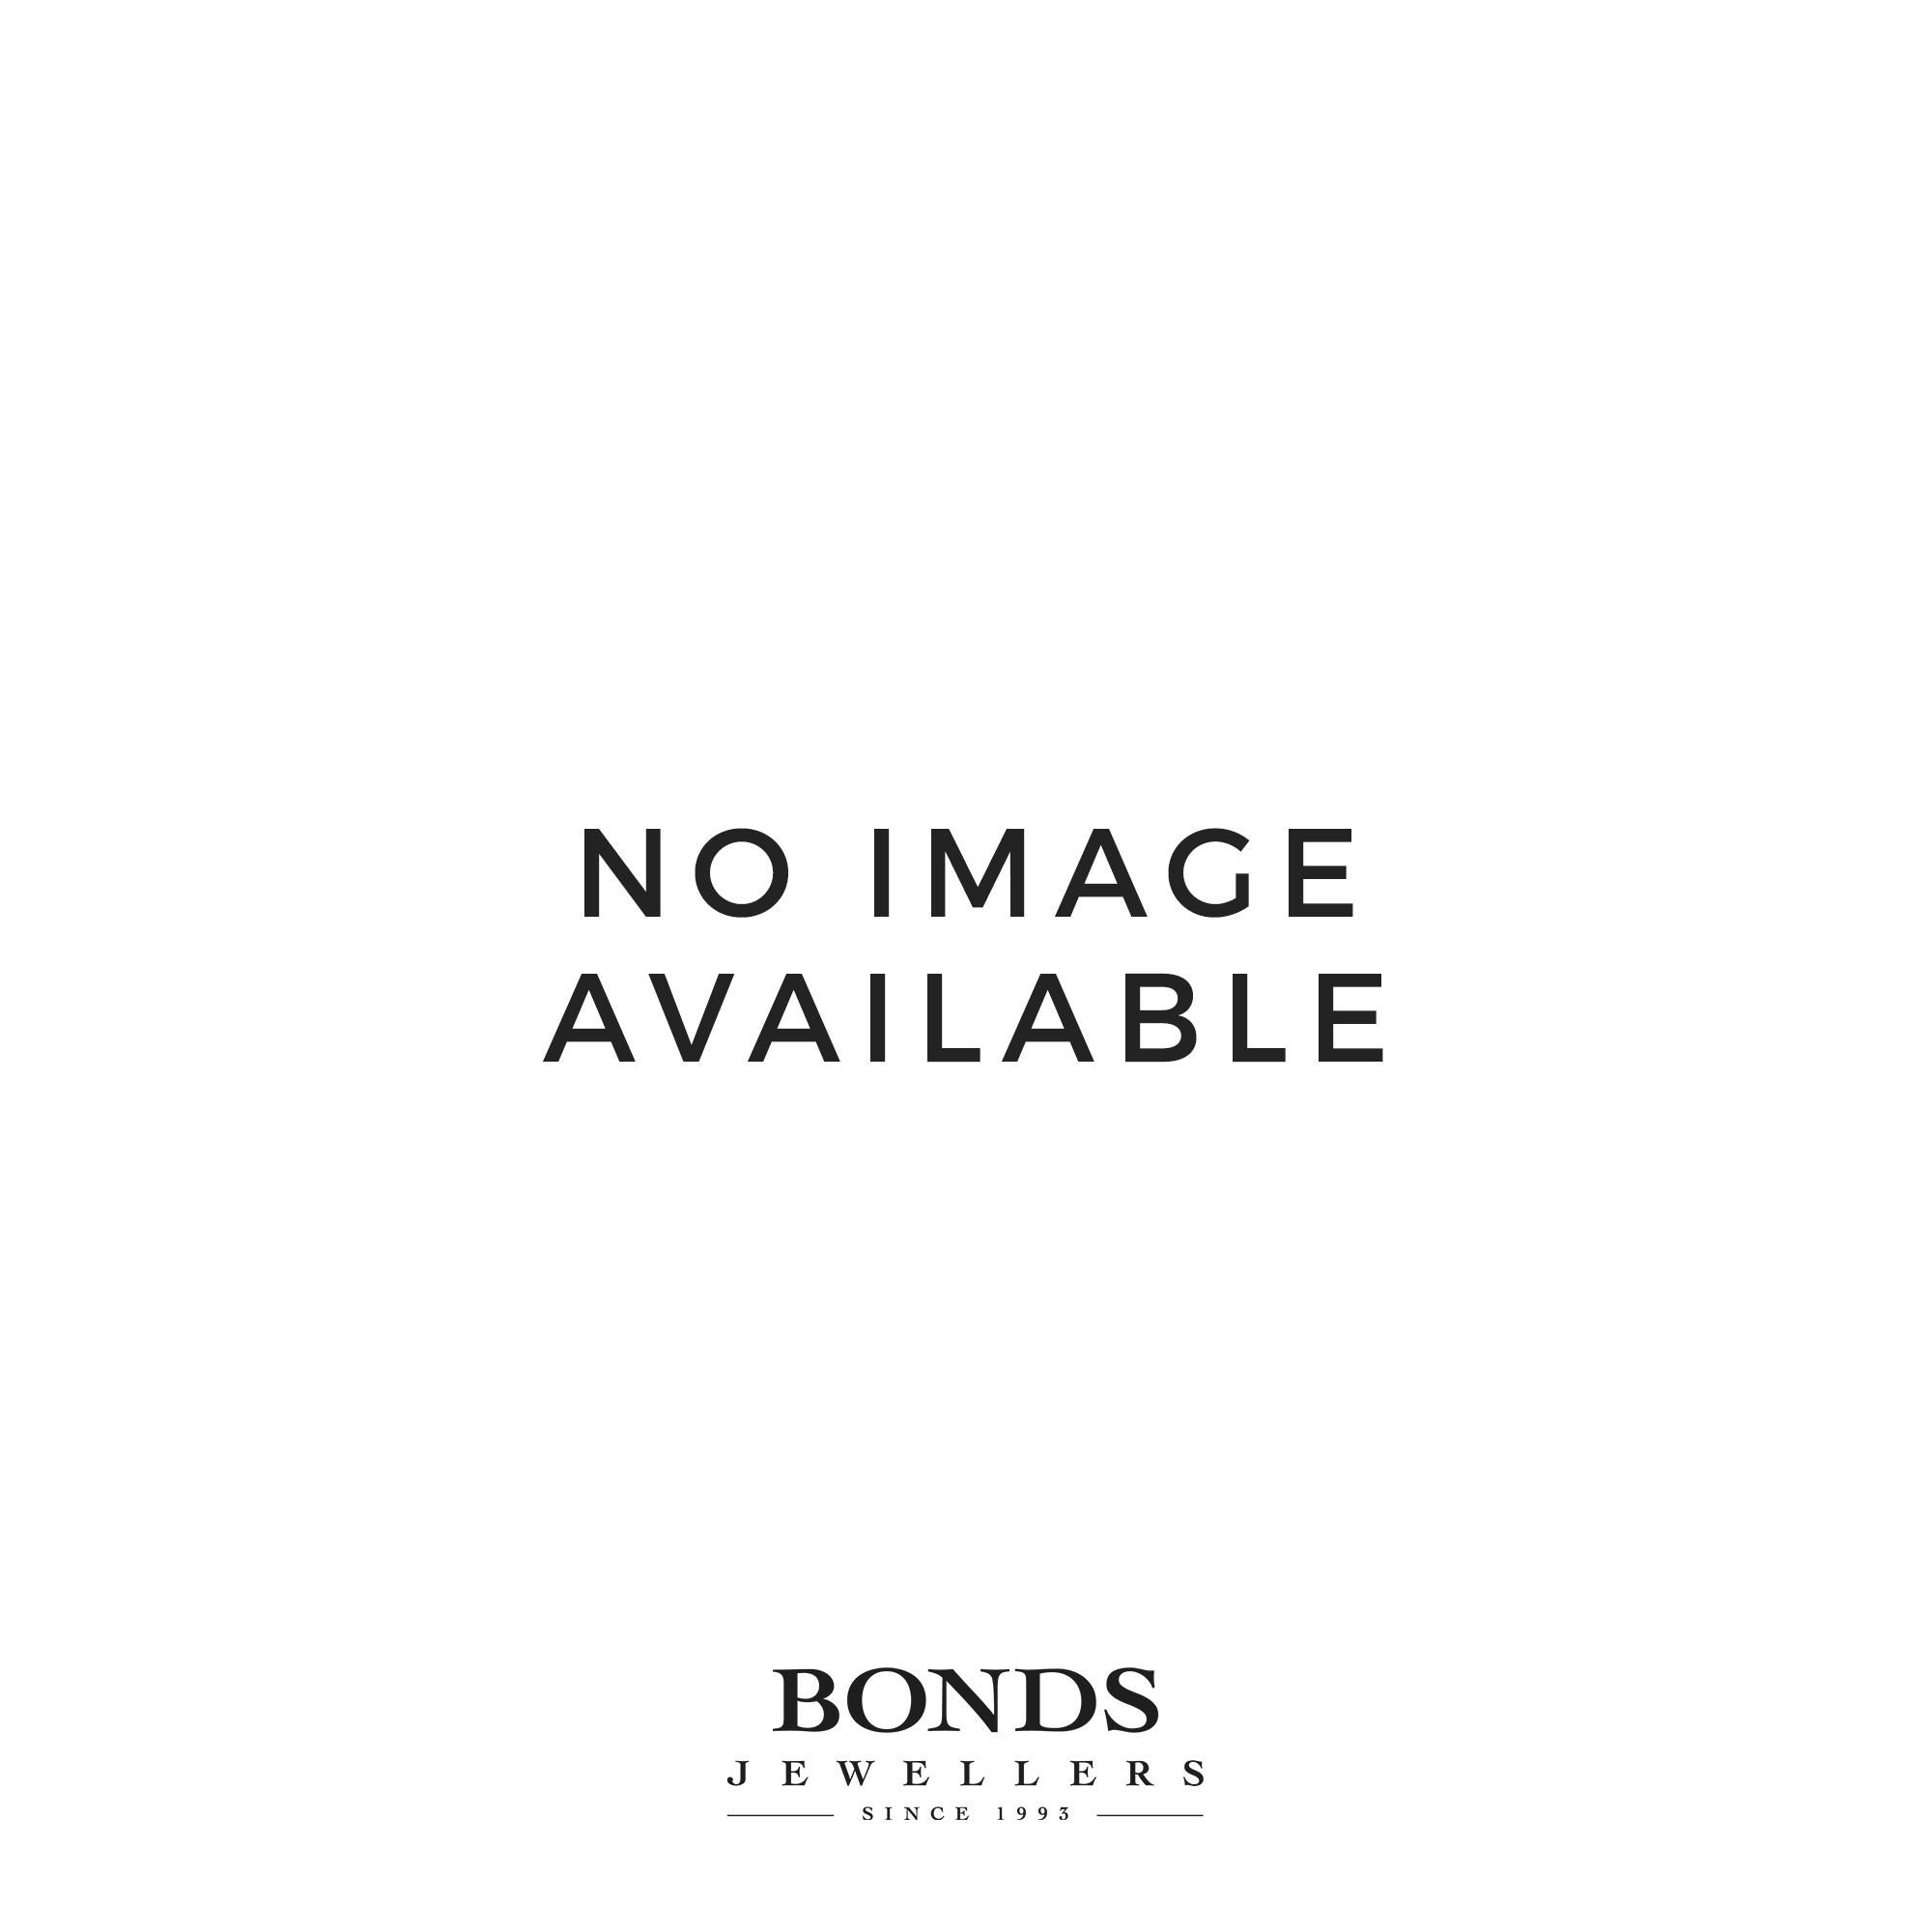 dfb40d6d6 Ted baker Kate Ladies Watch Black Floral Dial ¦ bonds jewellers